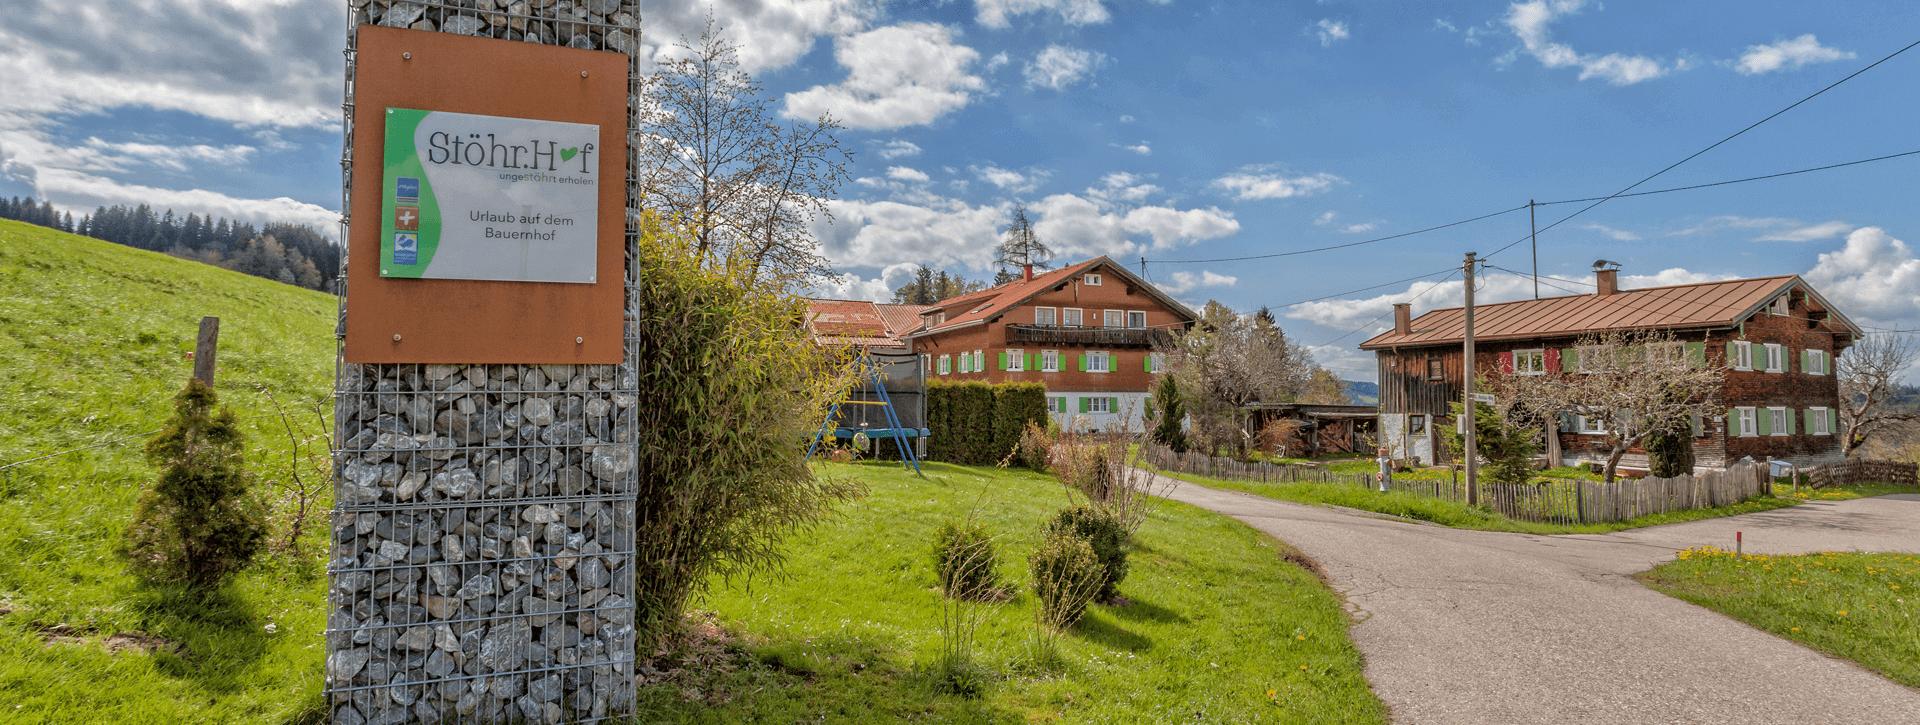 Stöhr.Hof Bauernhof